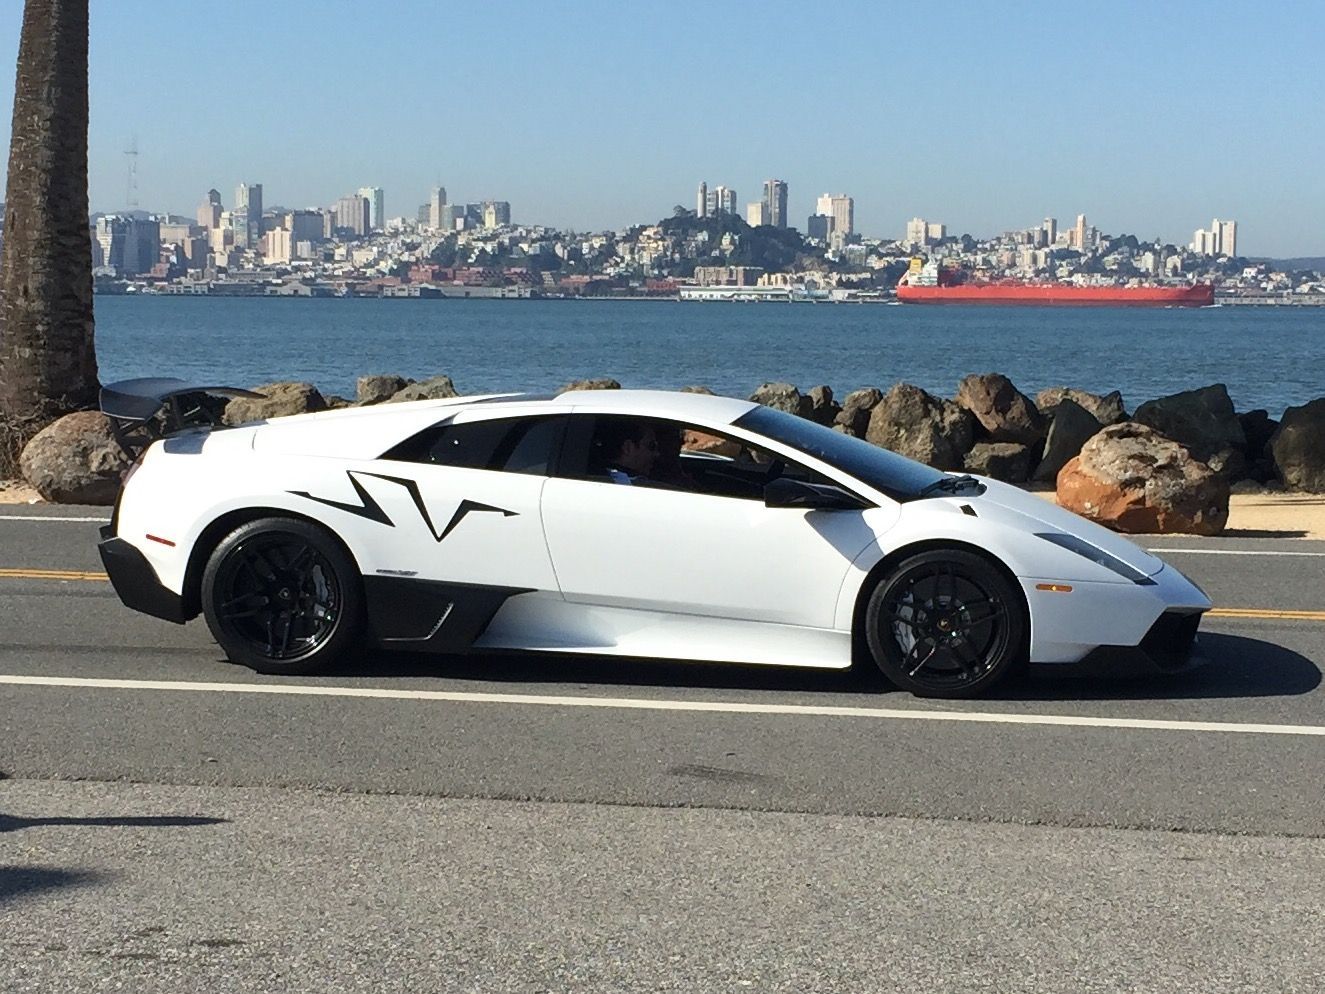 Lamborghini San Francisco >> Lamborghini Cars And Coffee San Francisco March 2015 White